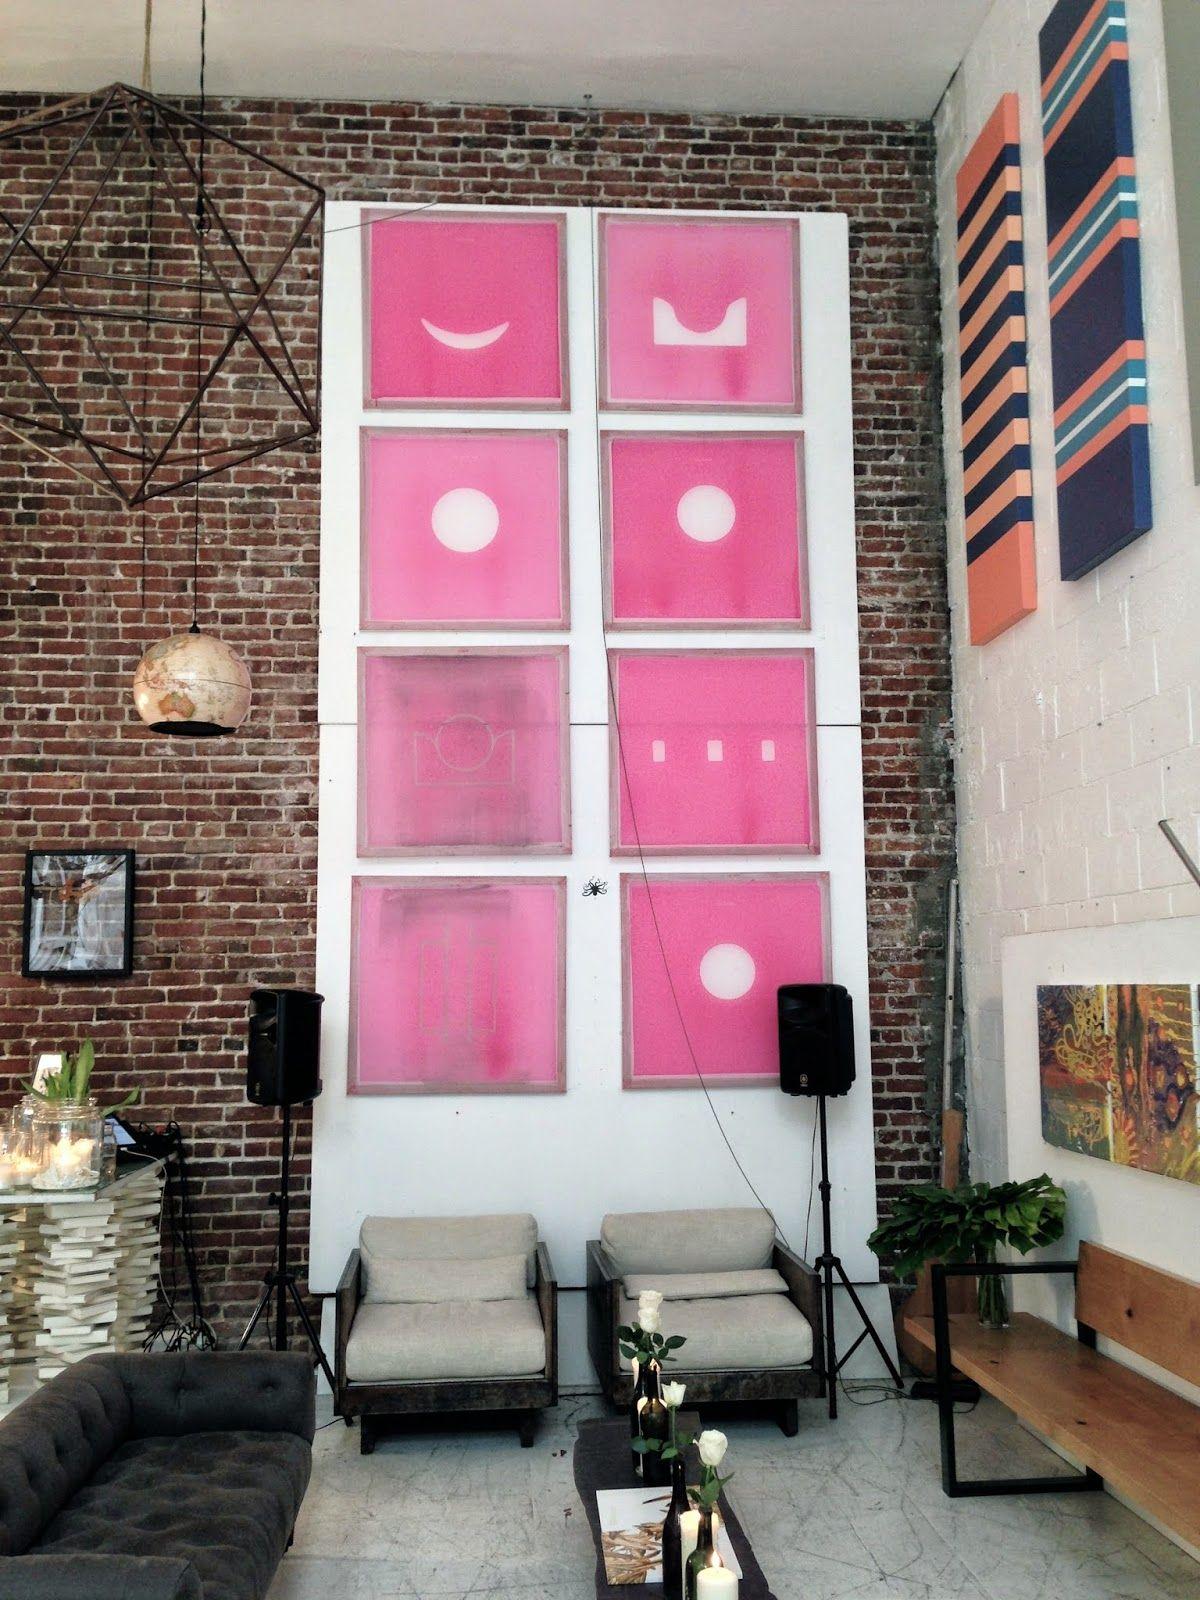 Natural curiosities art house creative space pinterest fun diy